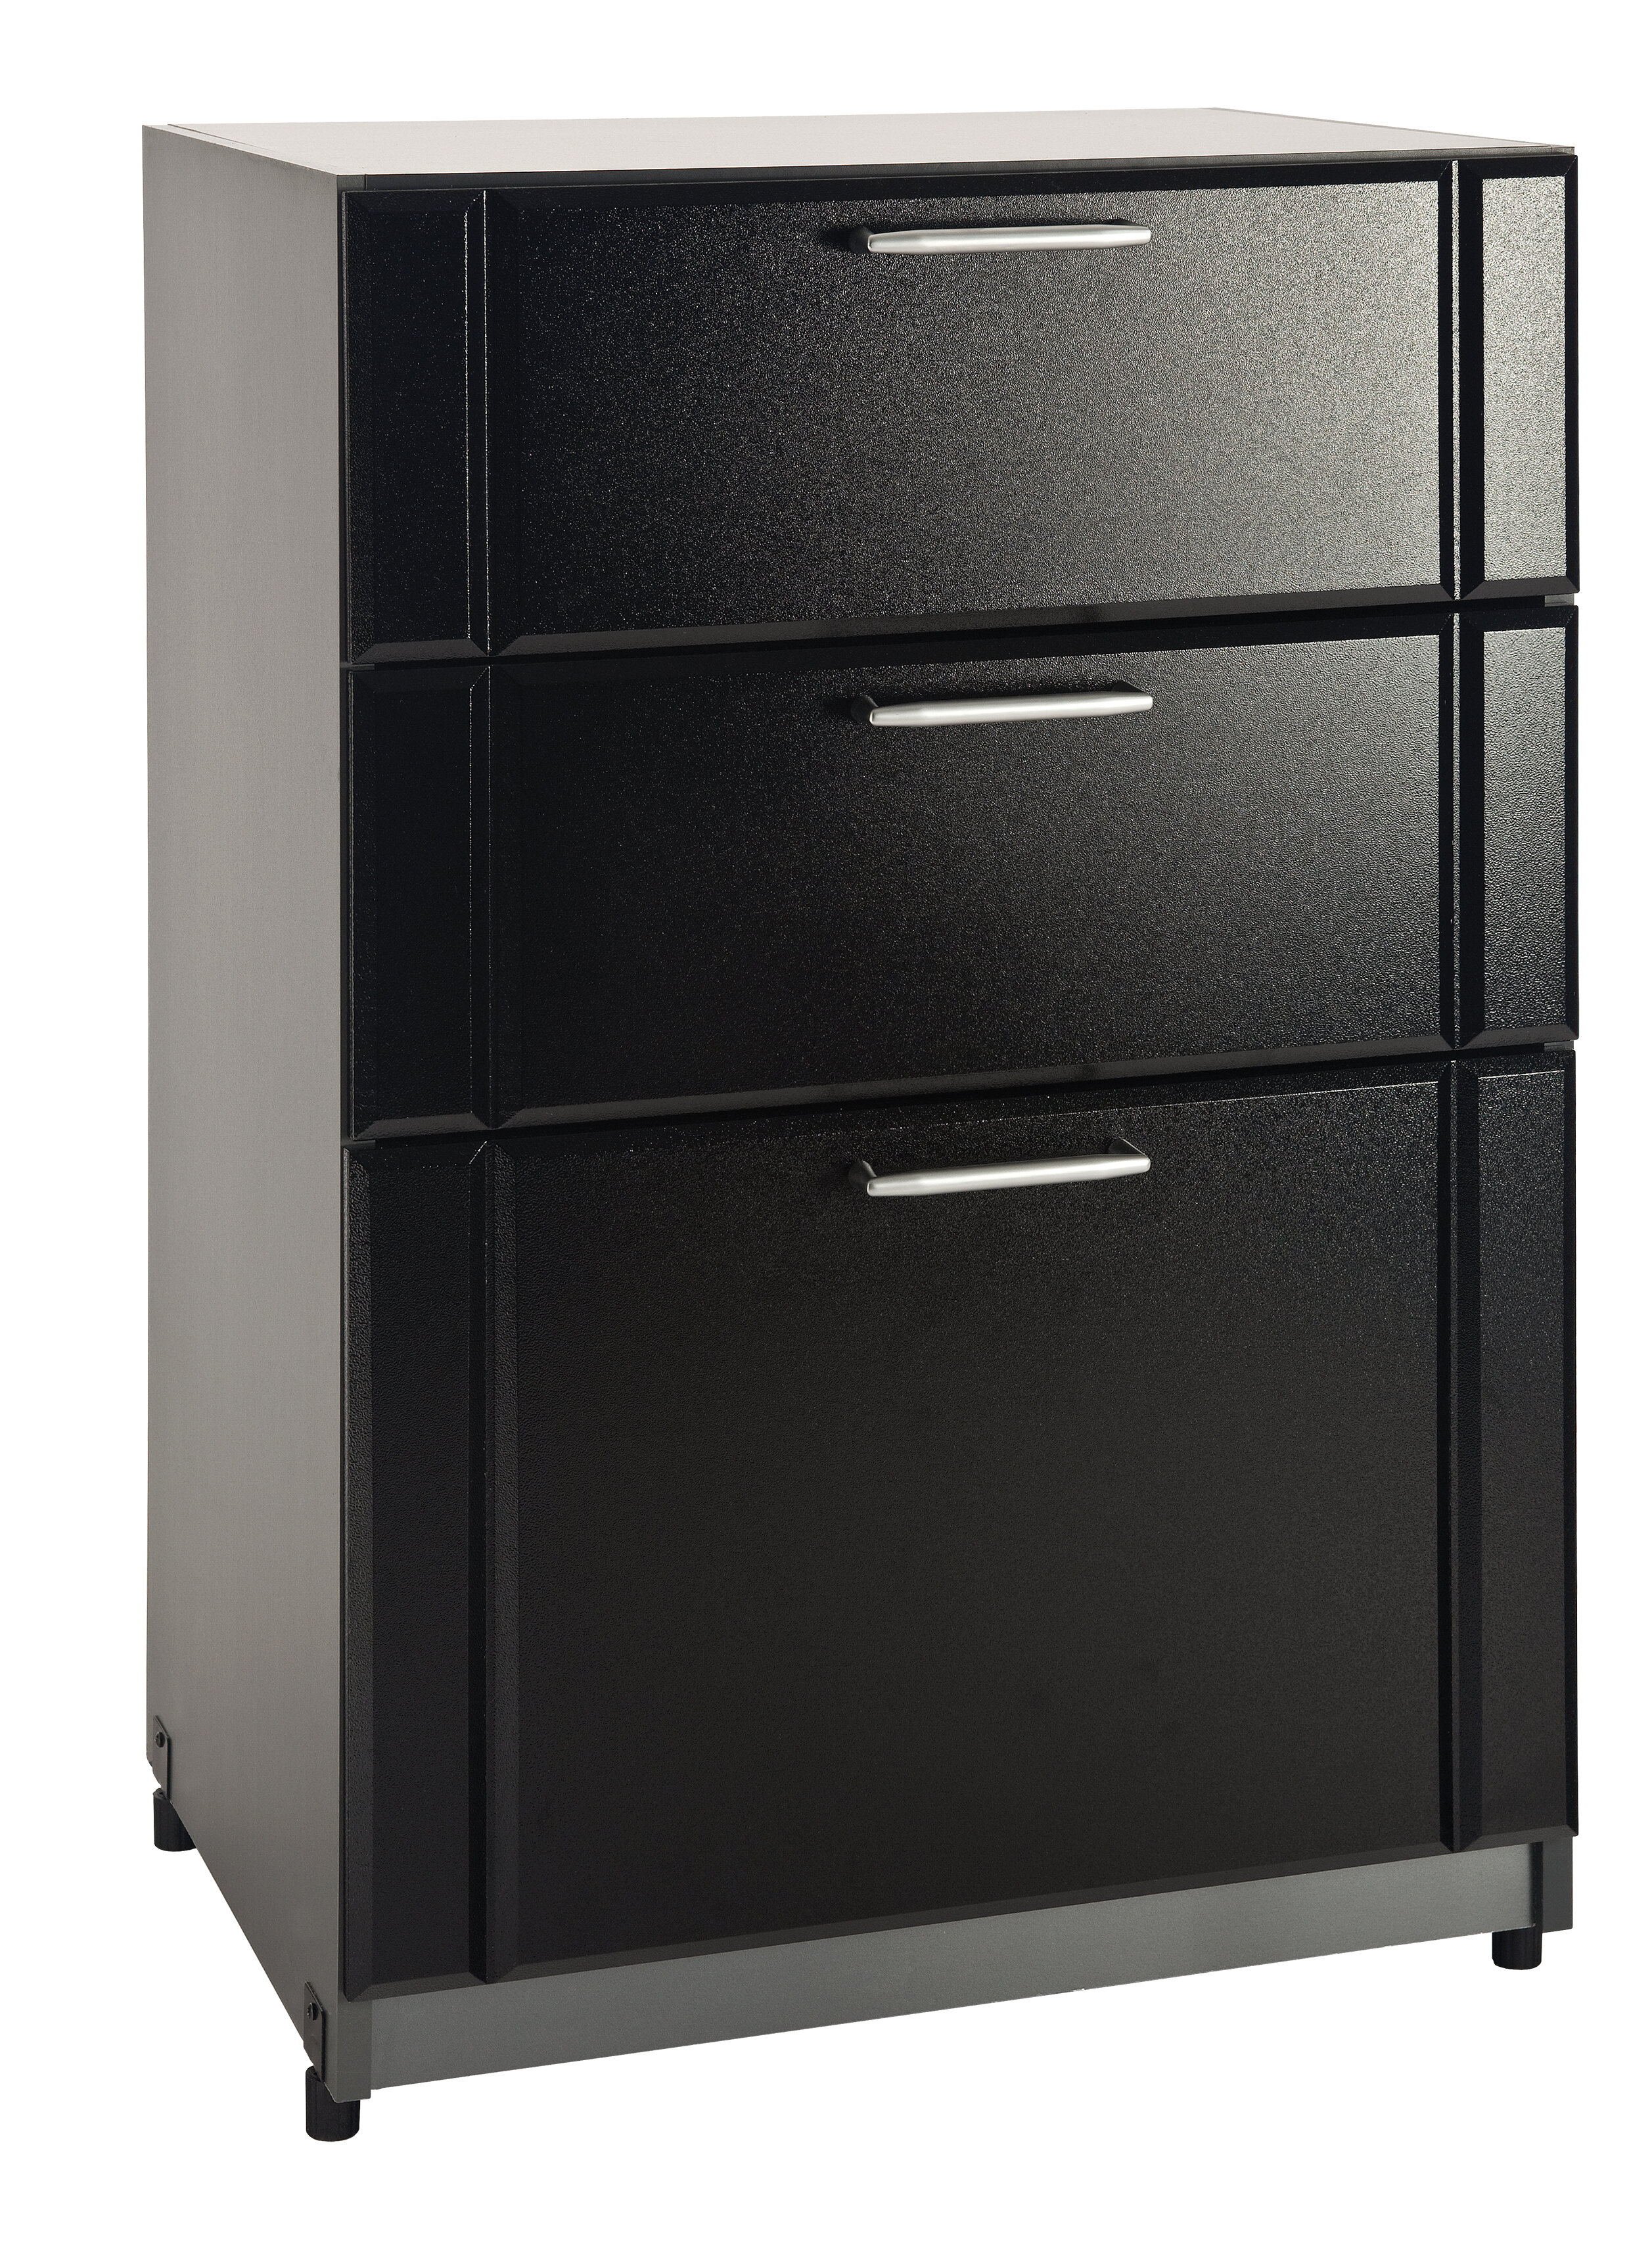 "ClosetMaid 37"" H x 24"" W x 18 63"" D Base Cabinet"